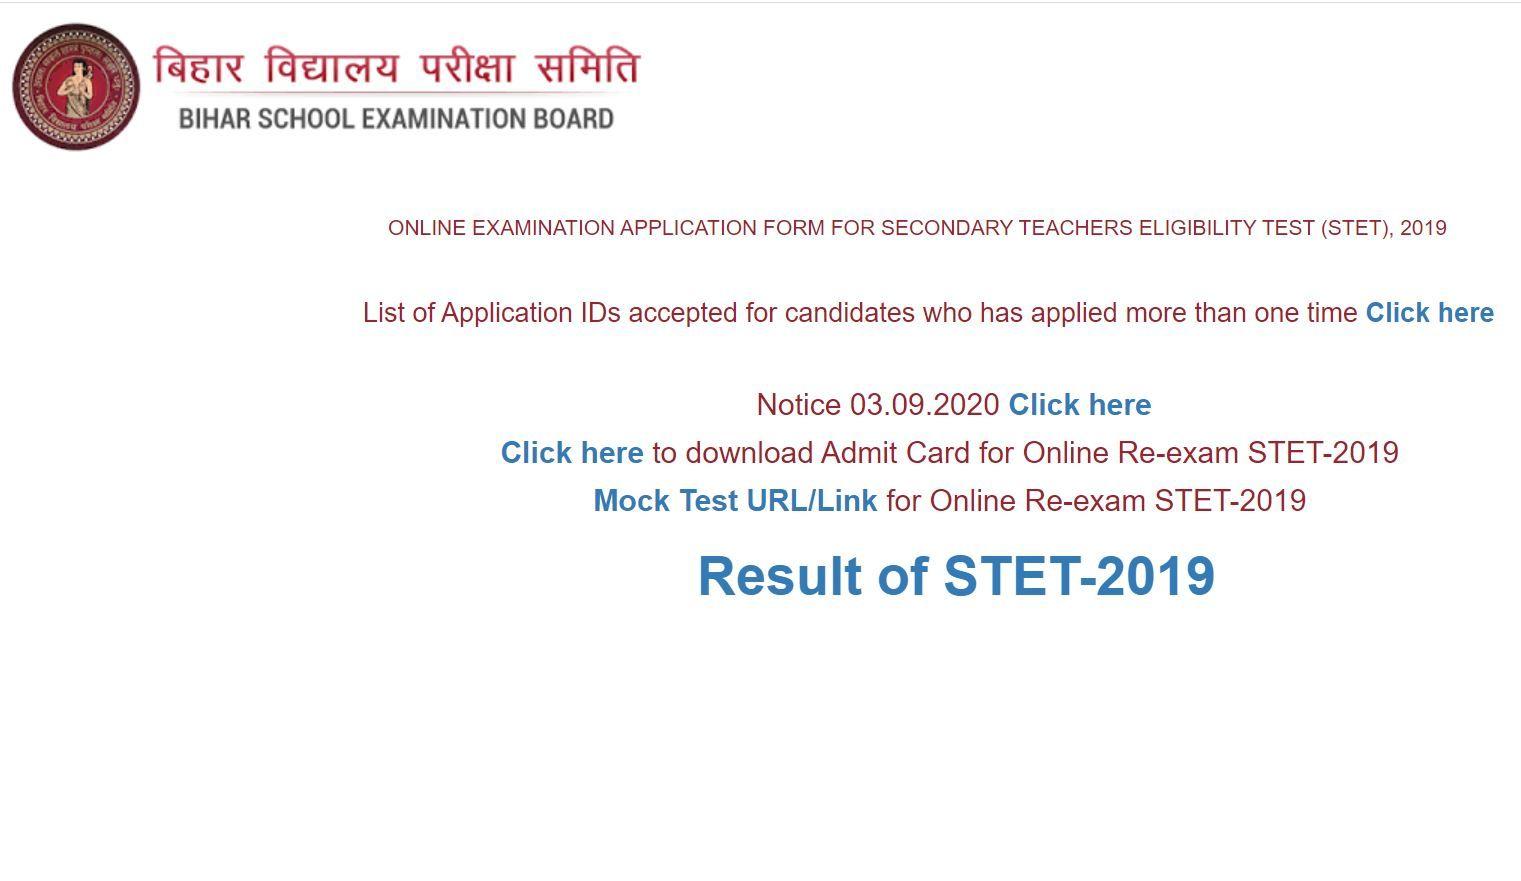 BSEB Releases Bihar STET 2019 Result; Here